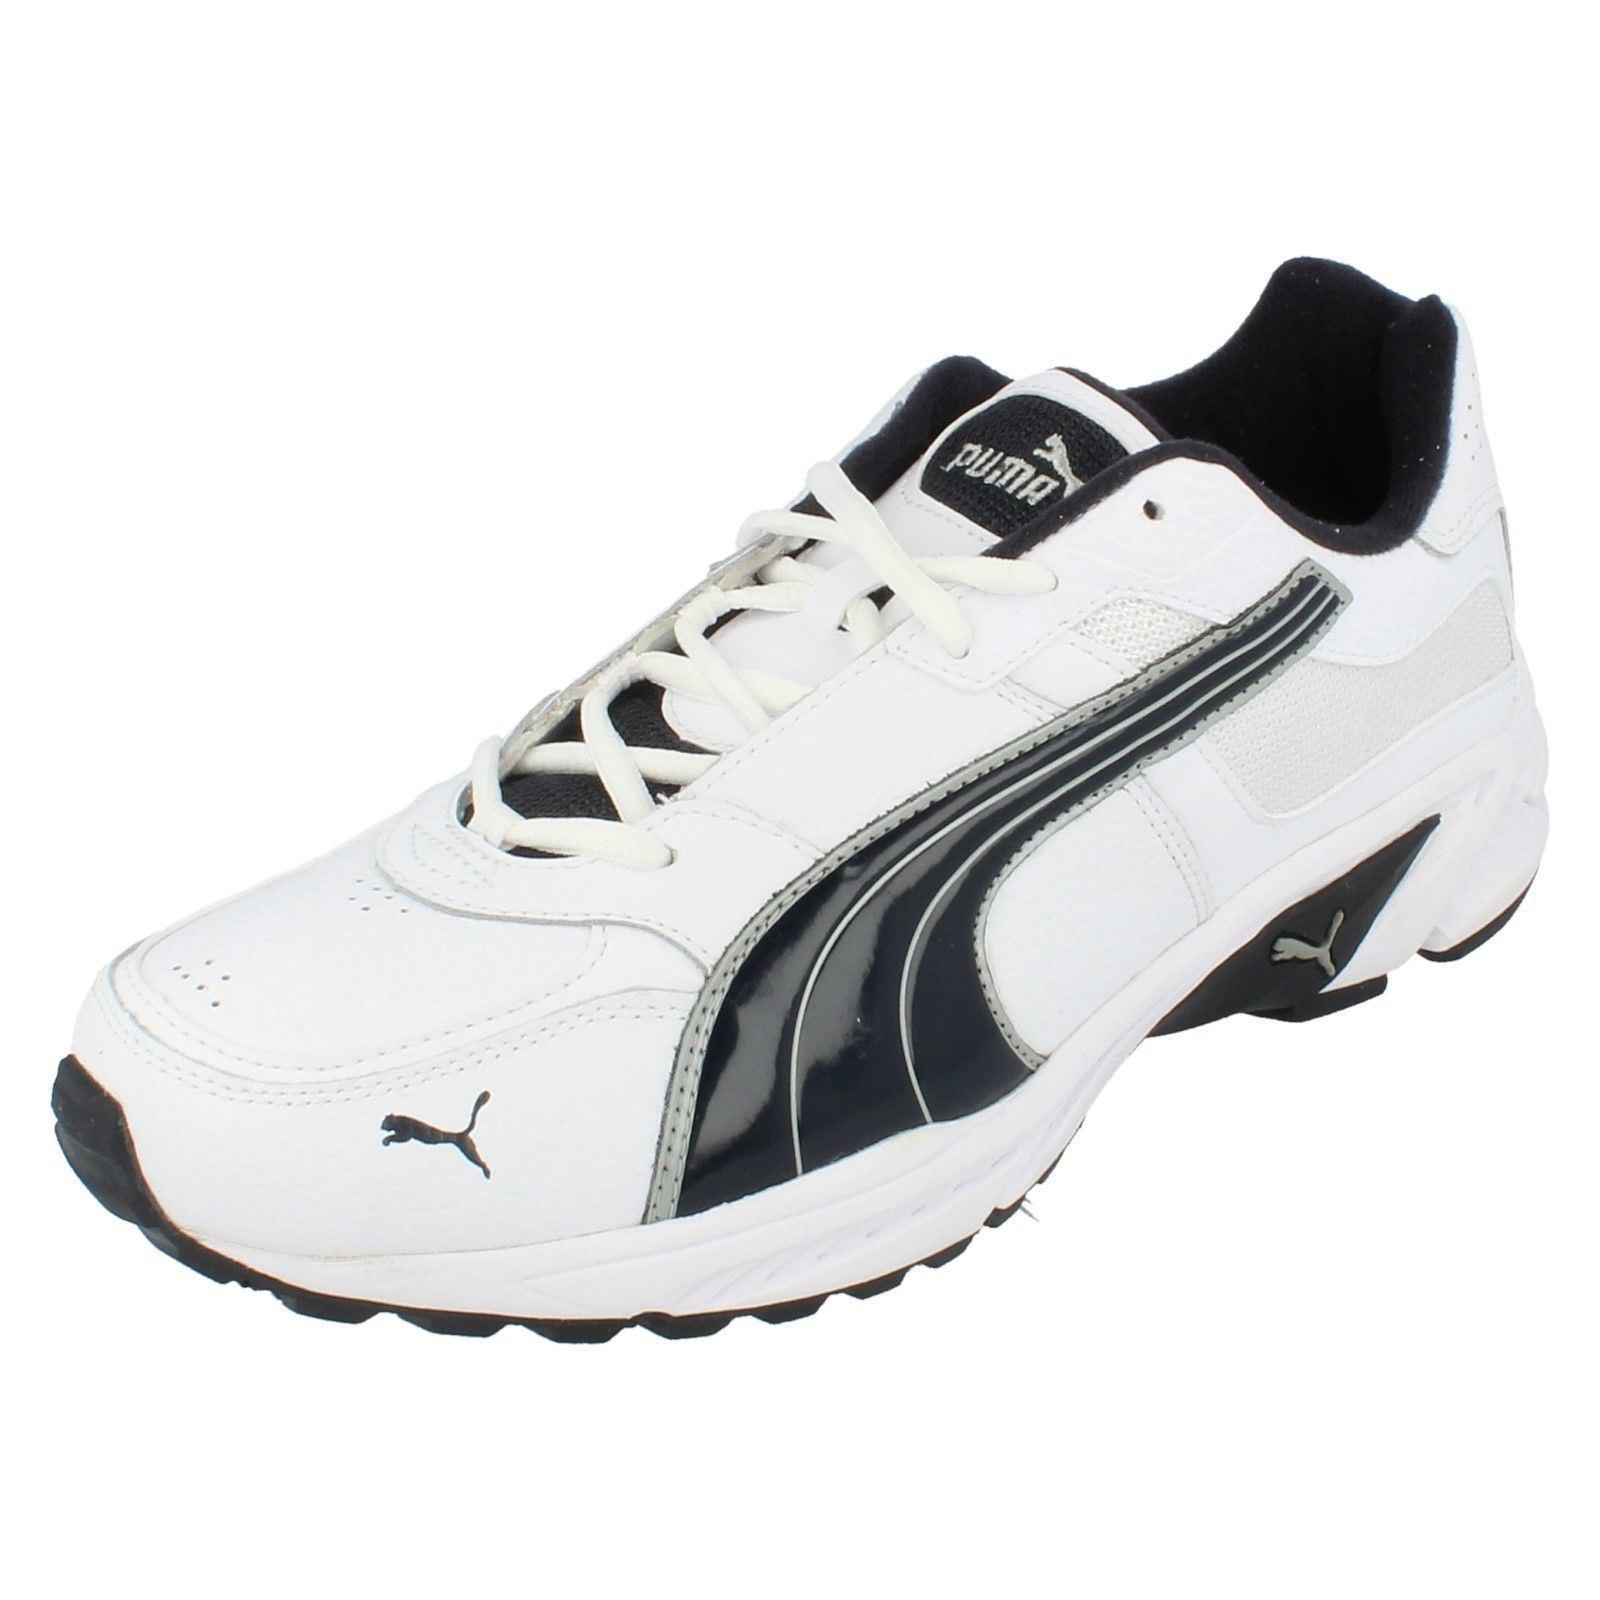 Puma Suede Mid Classic chomic sneaker uomo 357019 01 D121